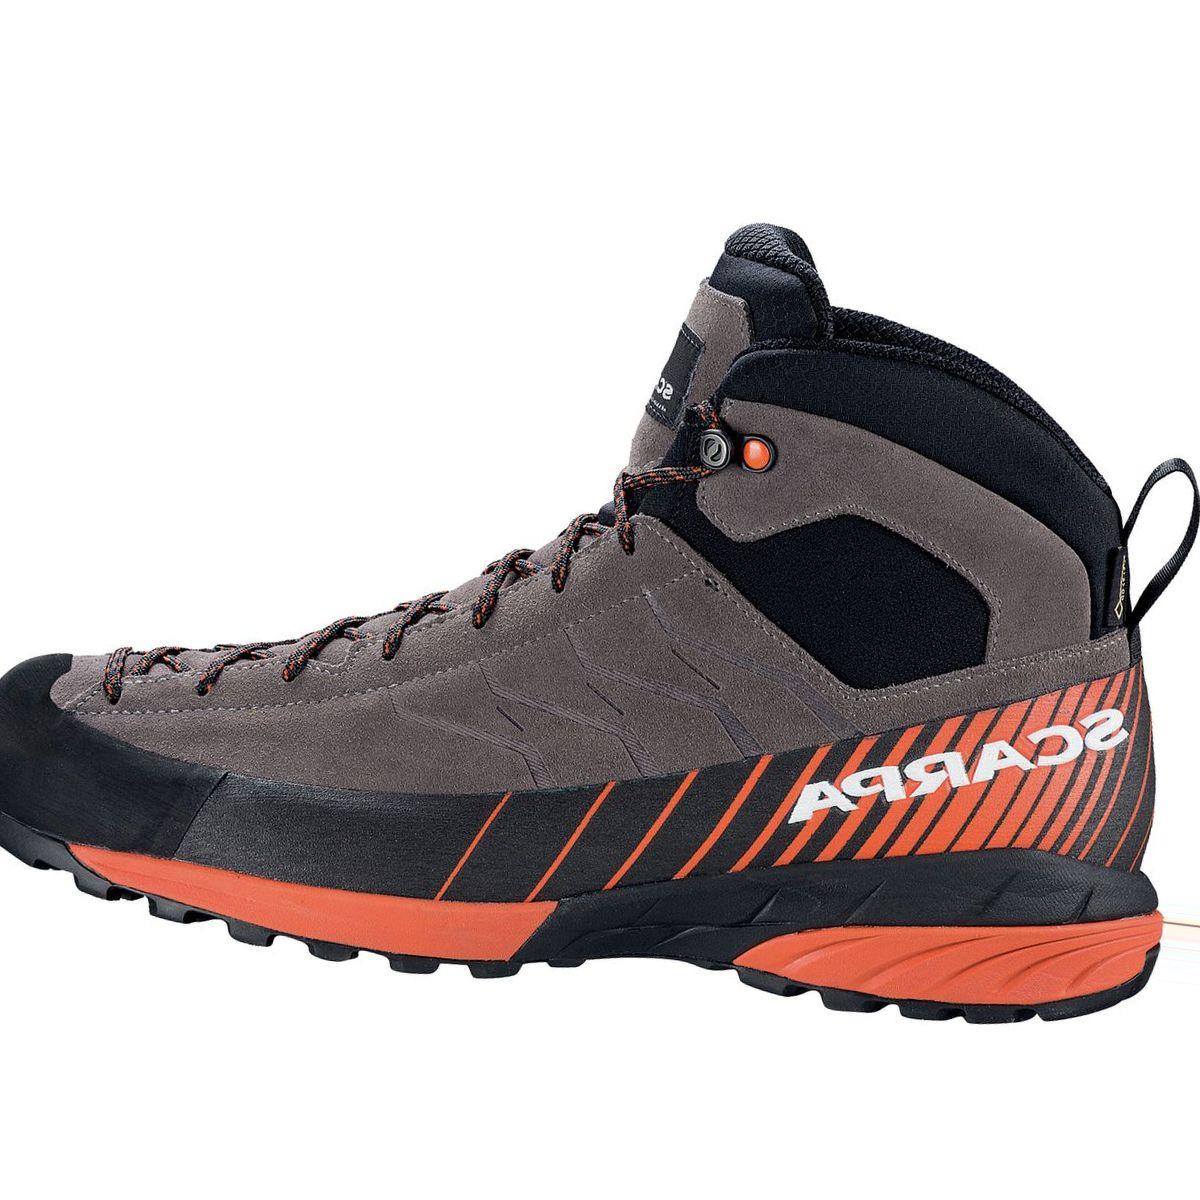 Scarpa Mescalito Mid GTX Shoe - Men's